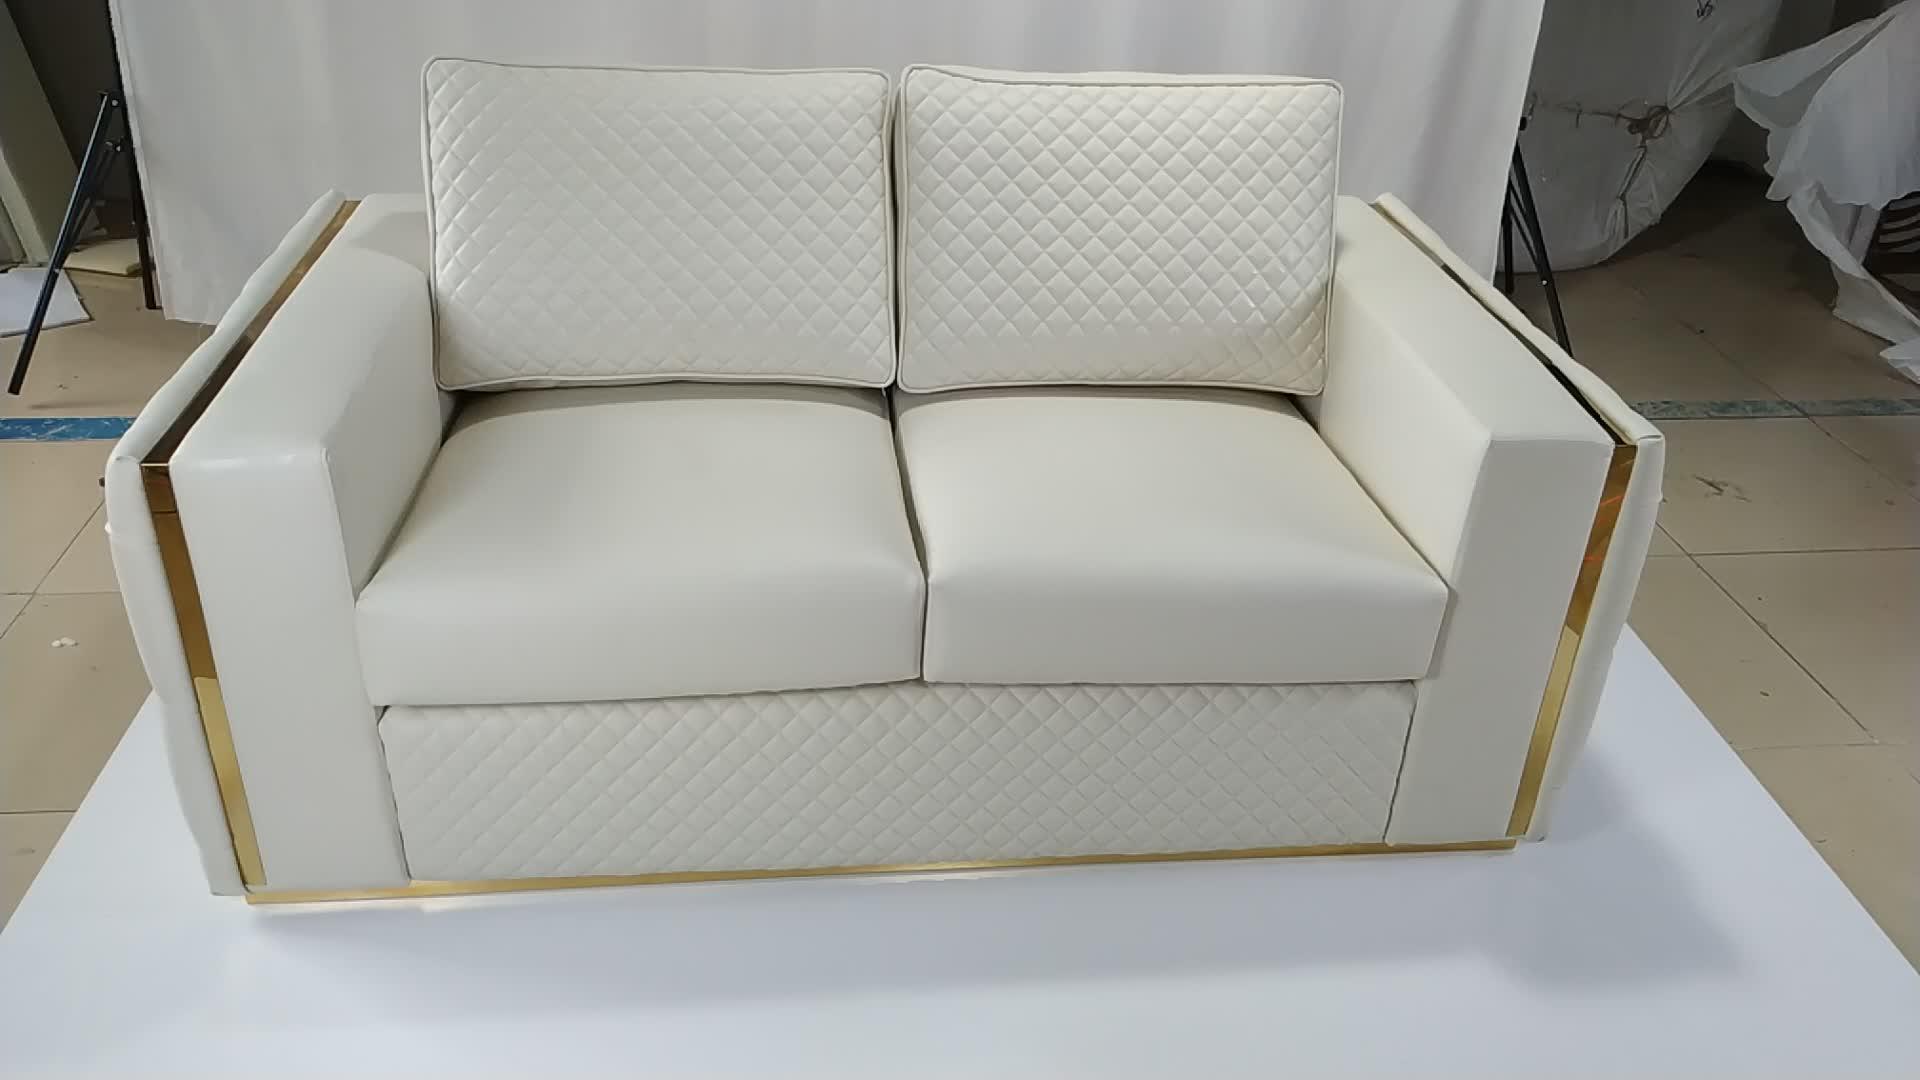 Nubuck leather new model sofa sets pictures luxury lounge furniture wedding Leather sofa set